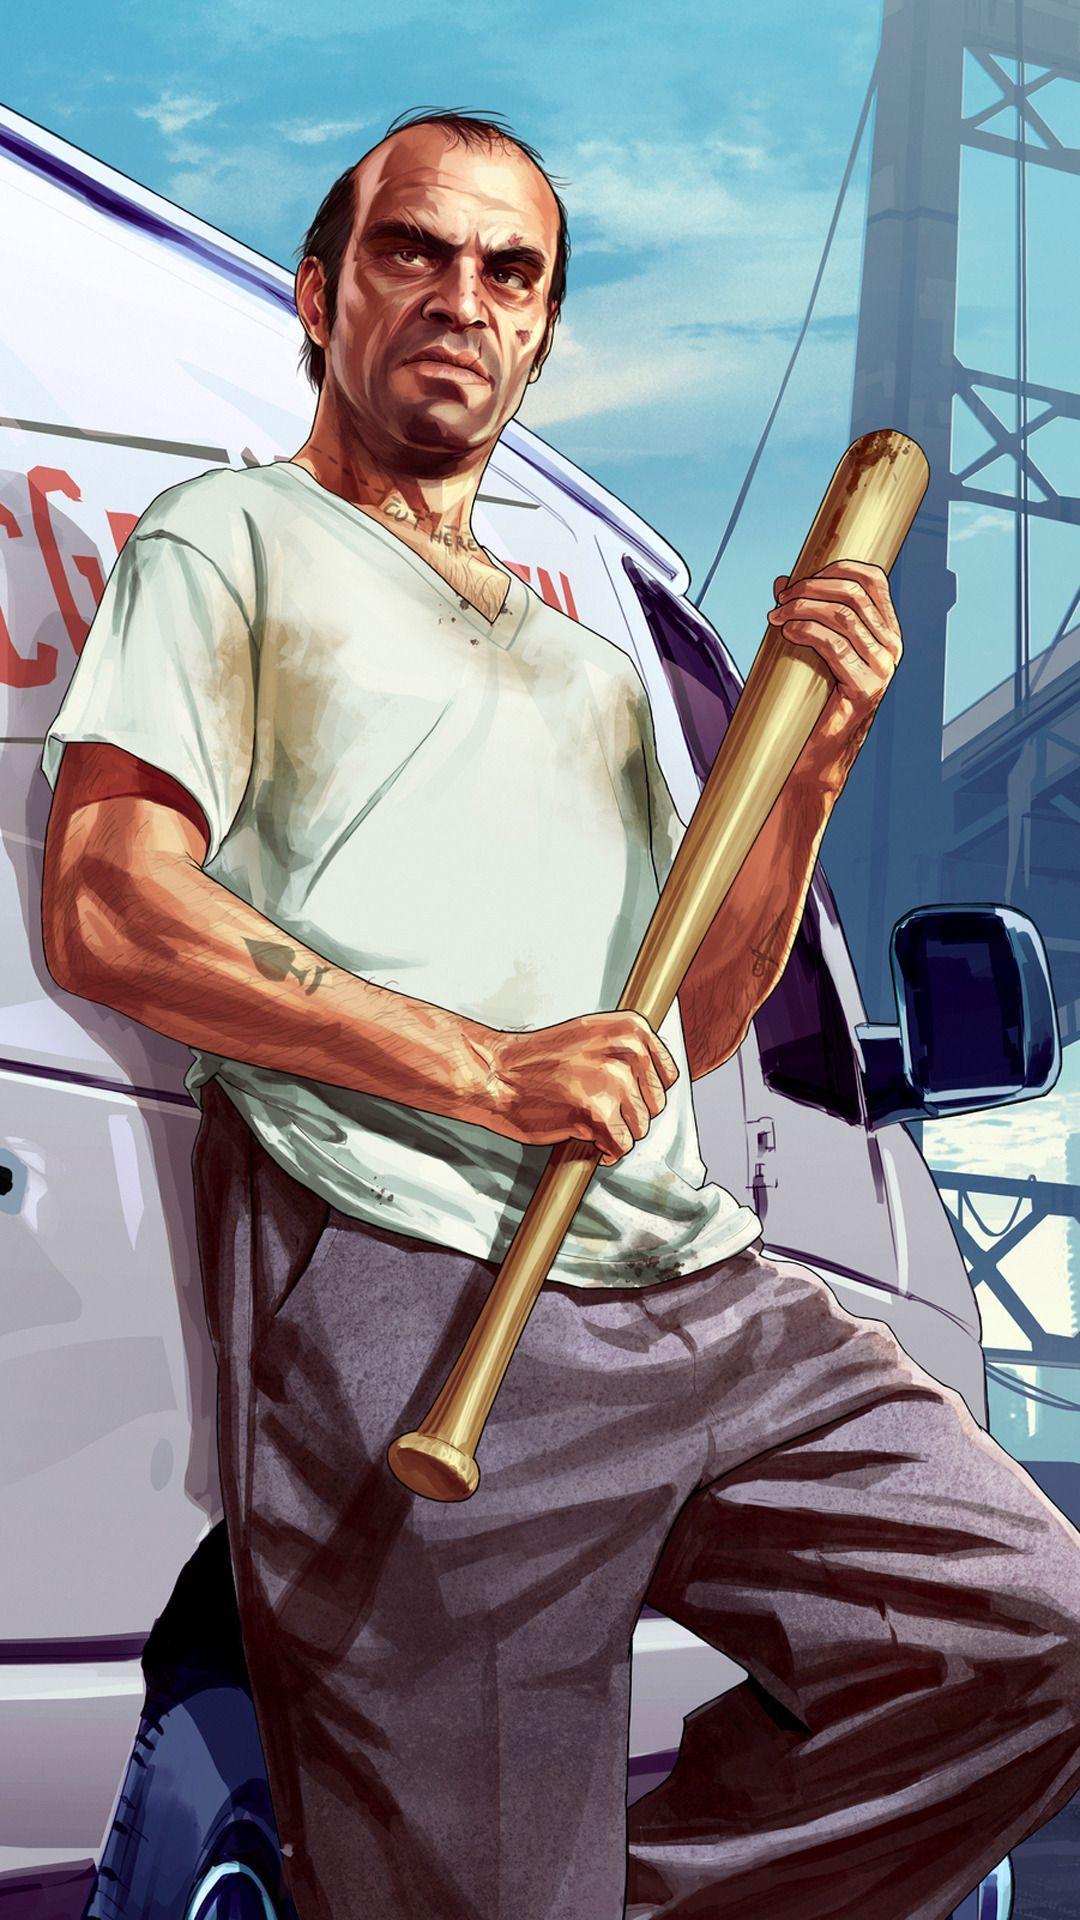 Franklin Gta V Wallpaper Mobile Grand Theft Auto Gta Gta 5